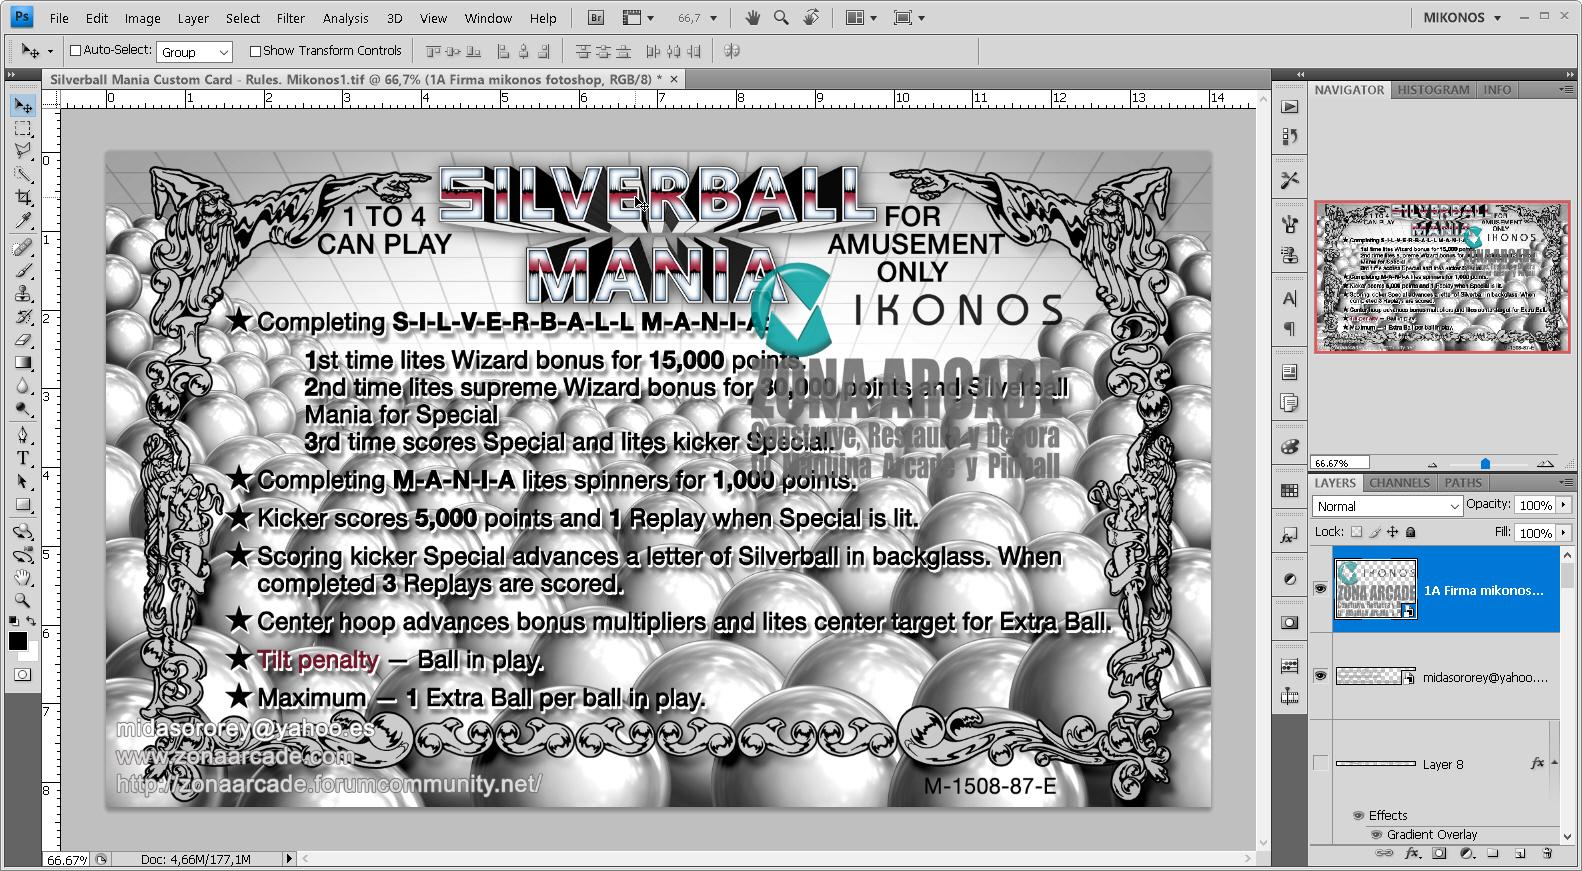 Silverball%20Mania%20Custom%20Pinball%20Card%20-%20Rules.%20Mikonos1.jpg